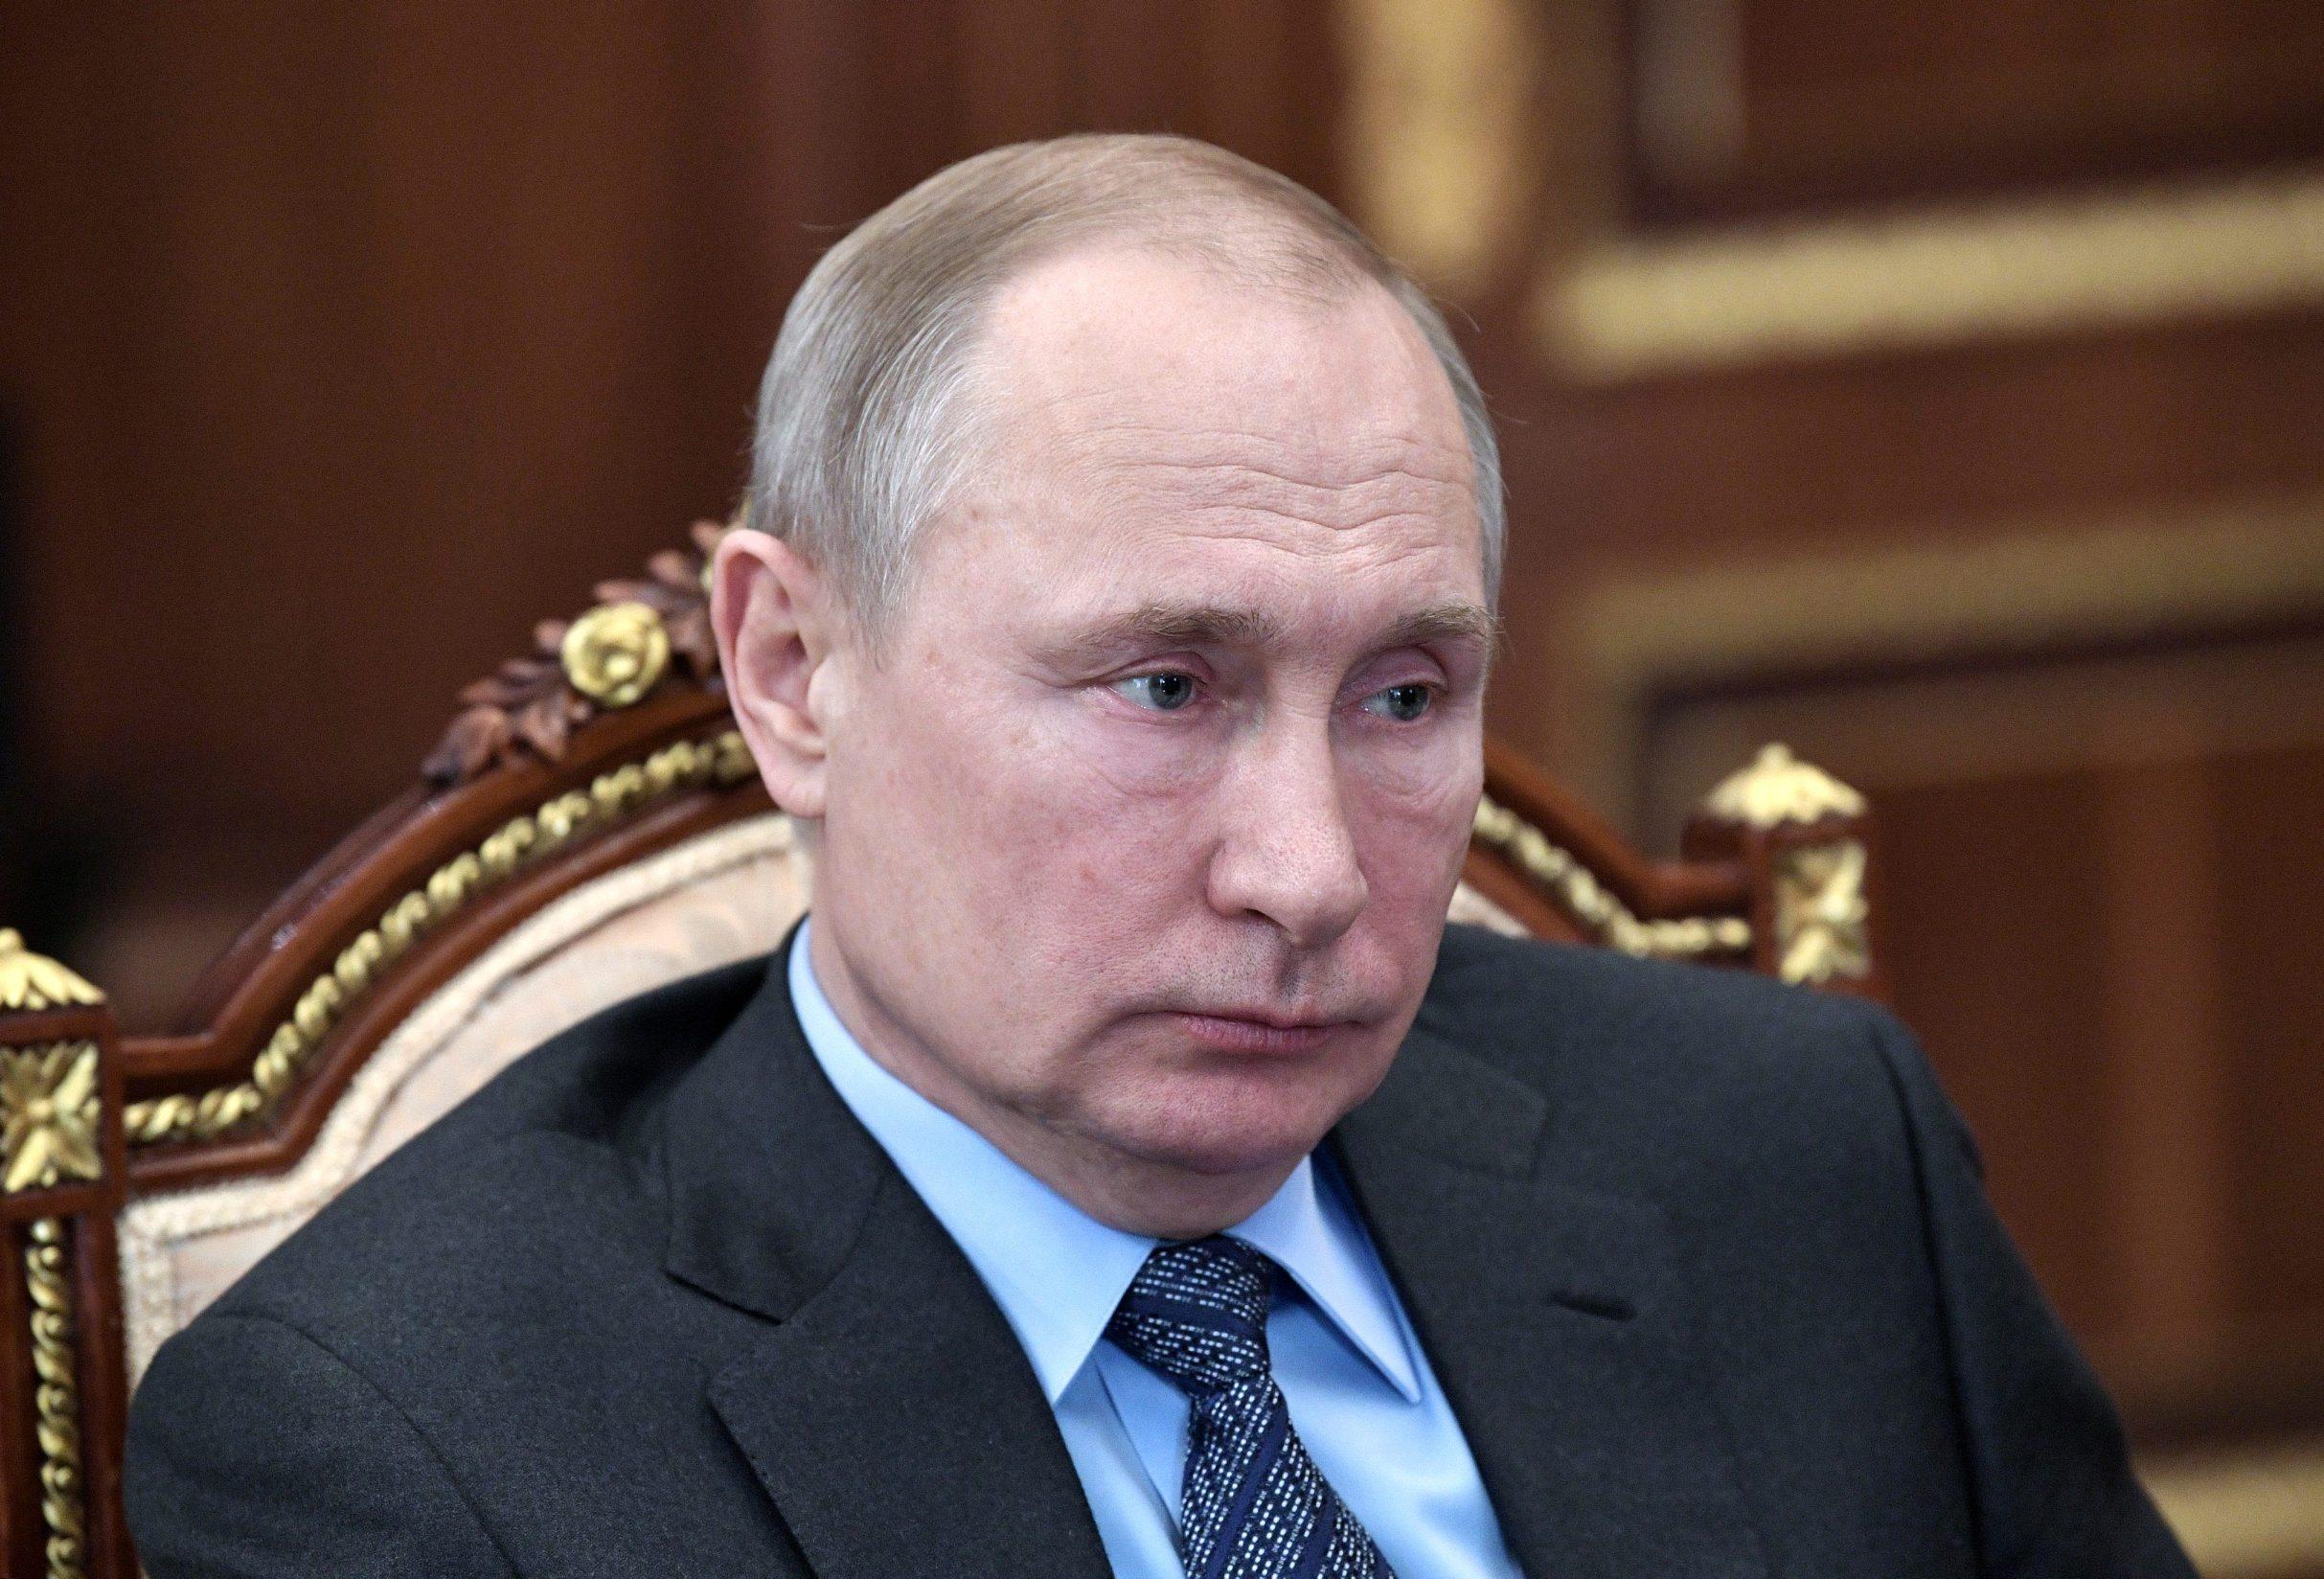 Ruski predsjednik Vladimir Putin na sastanku s izvršnim direkotorom Gapzroma Aleksejem Millerom